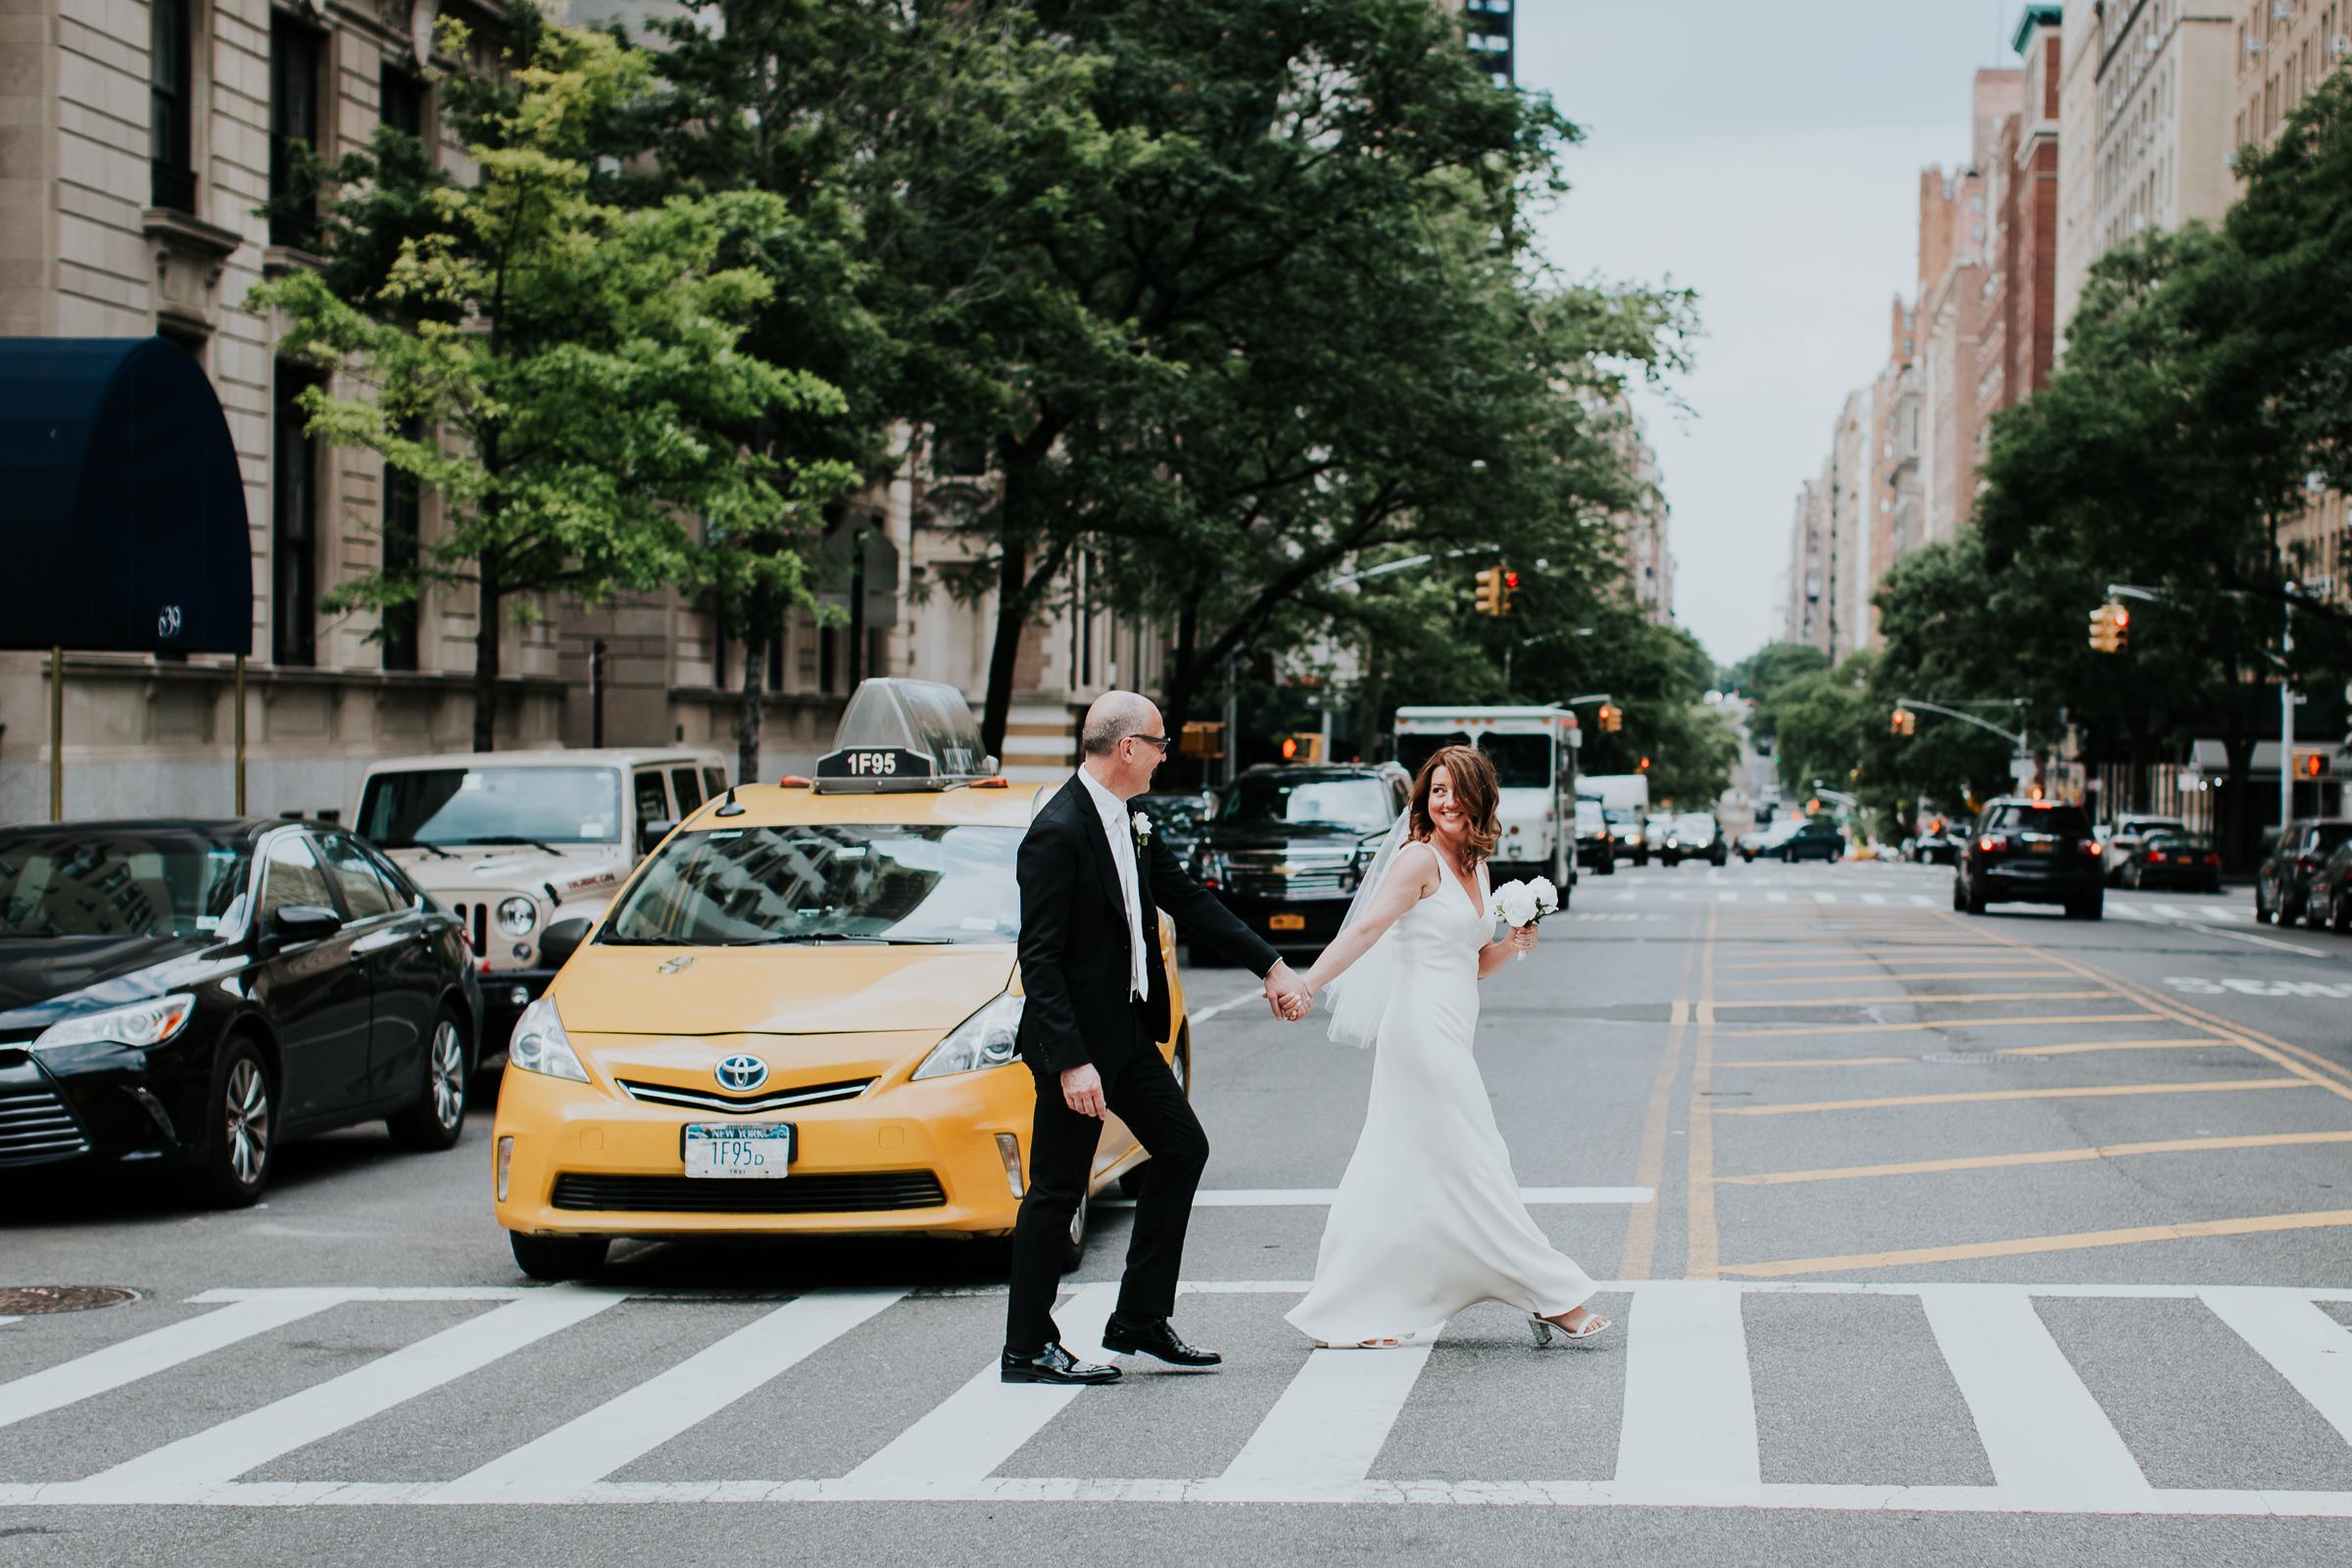 Robert-NYC-Museum-Of-Arts-&-Design-Greek-Italian-New-York-Documentary-Wedding-Photographer-31.jpg